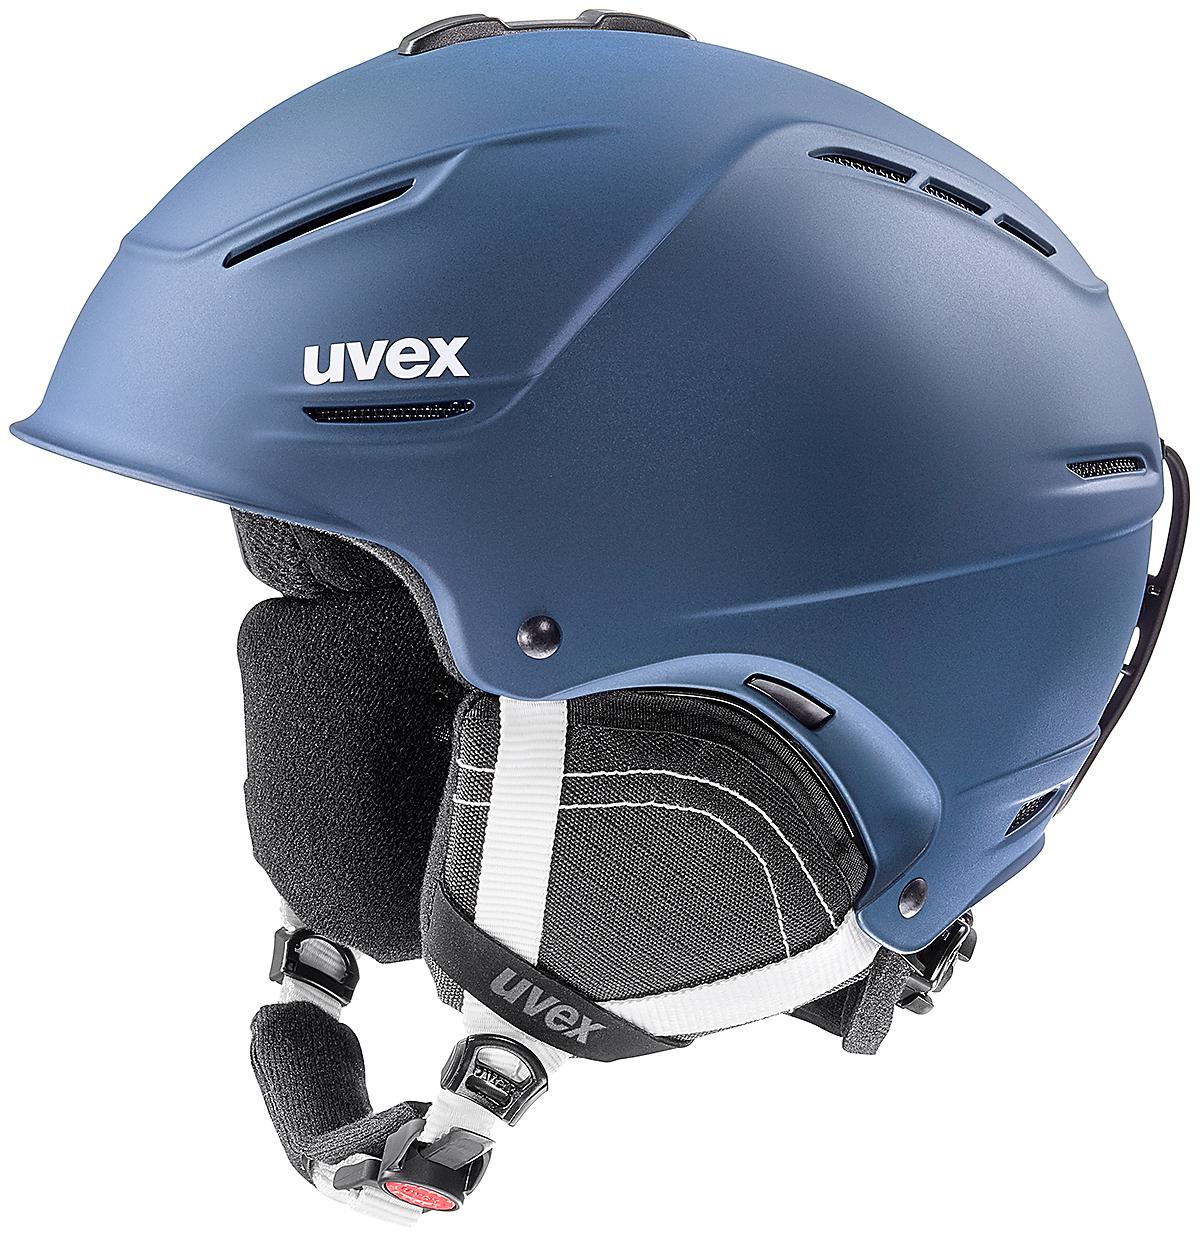 Uvex Шлем Uvex P1us 2.0 uvex маски горнолыжные